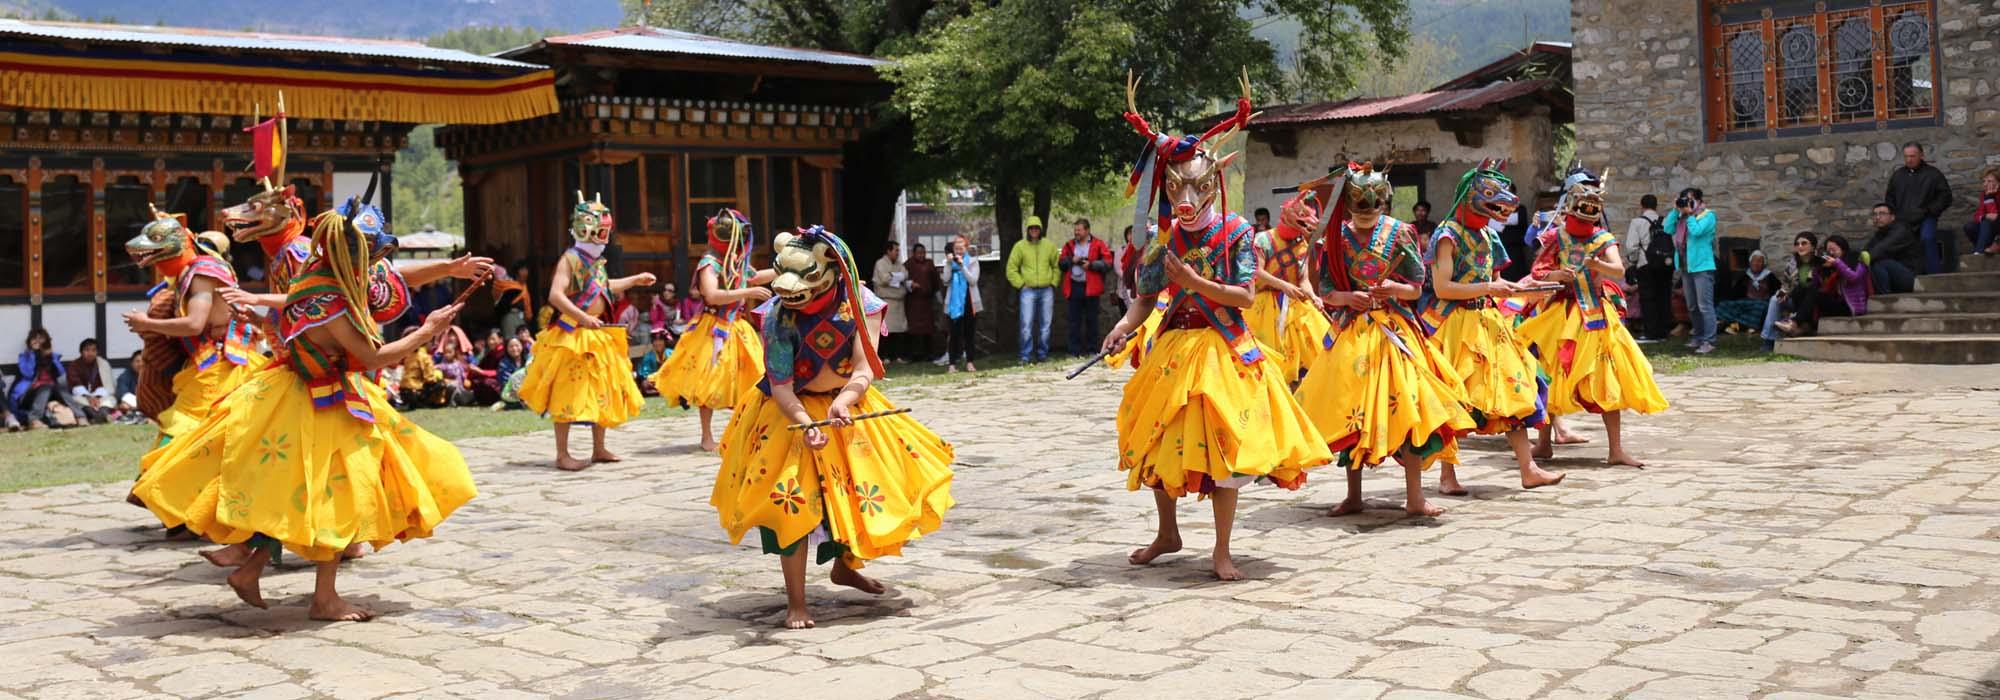 Bumthang Jambay Lhakhang Tshechu